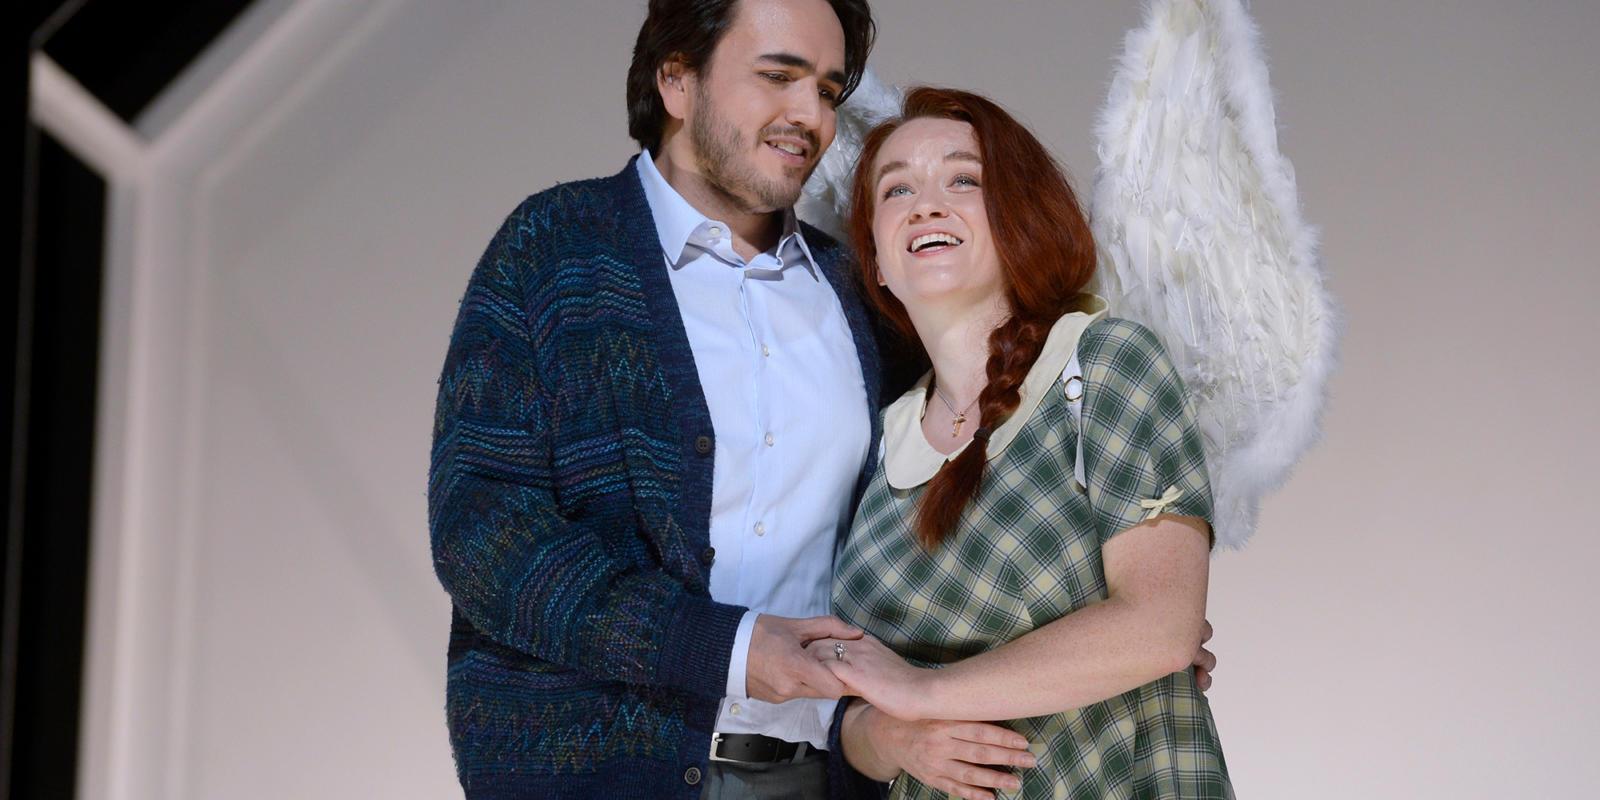 ENO1920 Luisa Miller: Rodrigo Porras Garulo as Rodolfo and Izabela Matula in Oper Wuppertal's production (c) Jens Grossmann